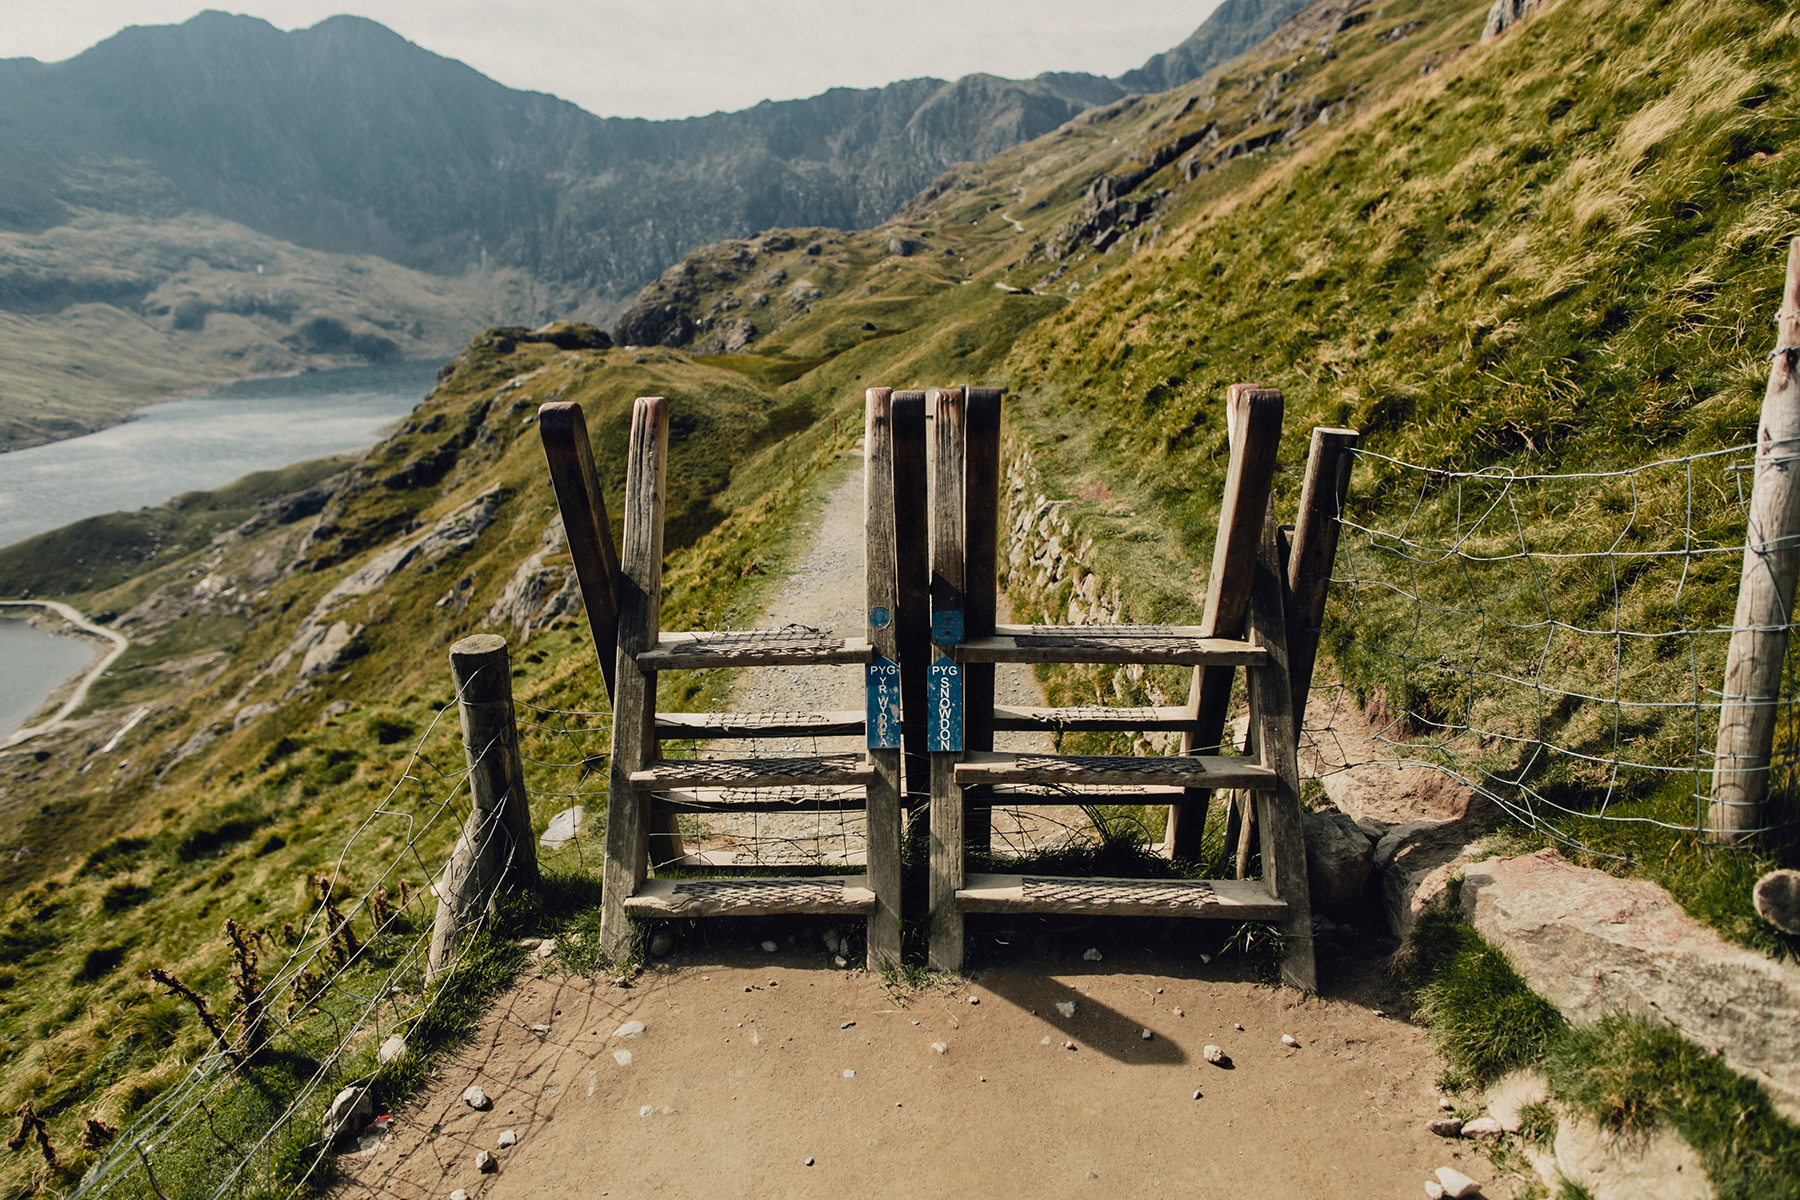 Mt-Snowdon-Hike-Photos-From-Peny-Pass-00071.jpg